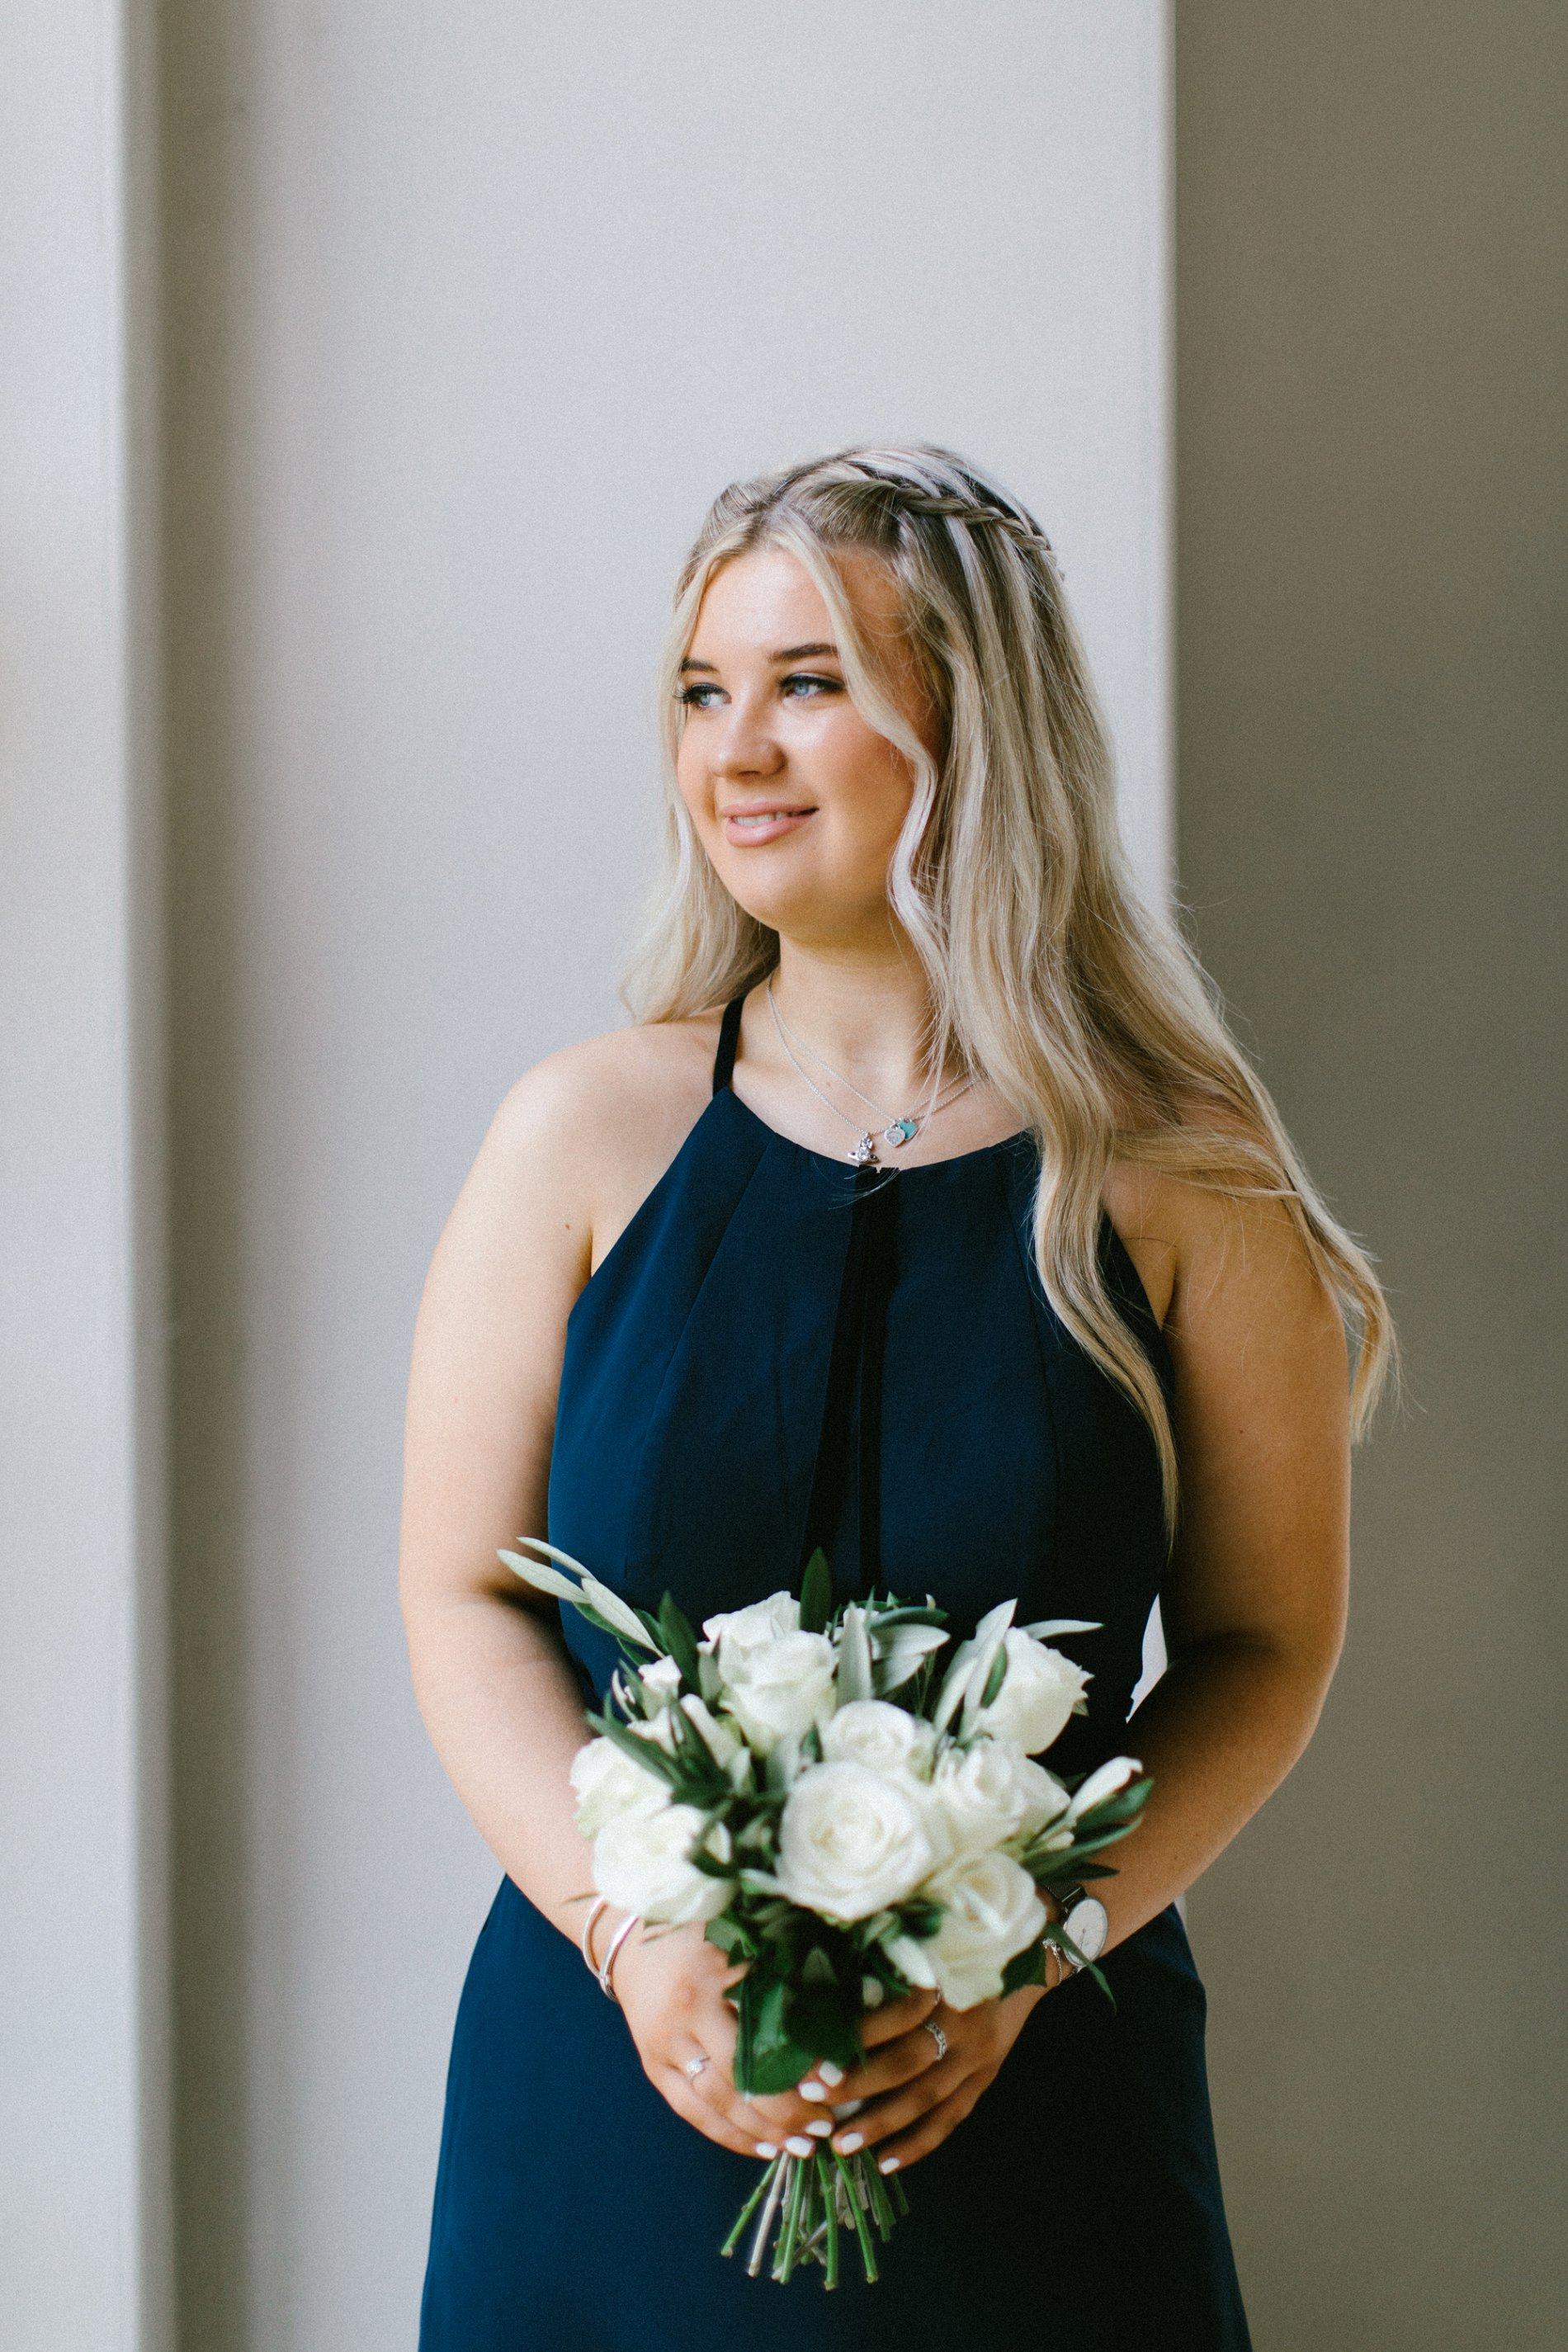 An Intimate Fine Art Wedding Shoot at Newby Hall (c) Melissa Beattie Photography (15)